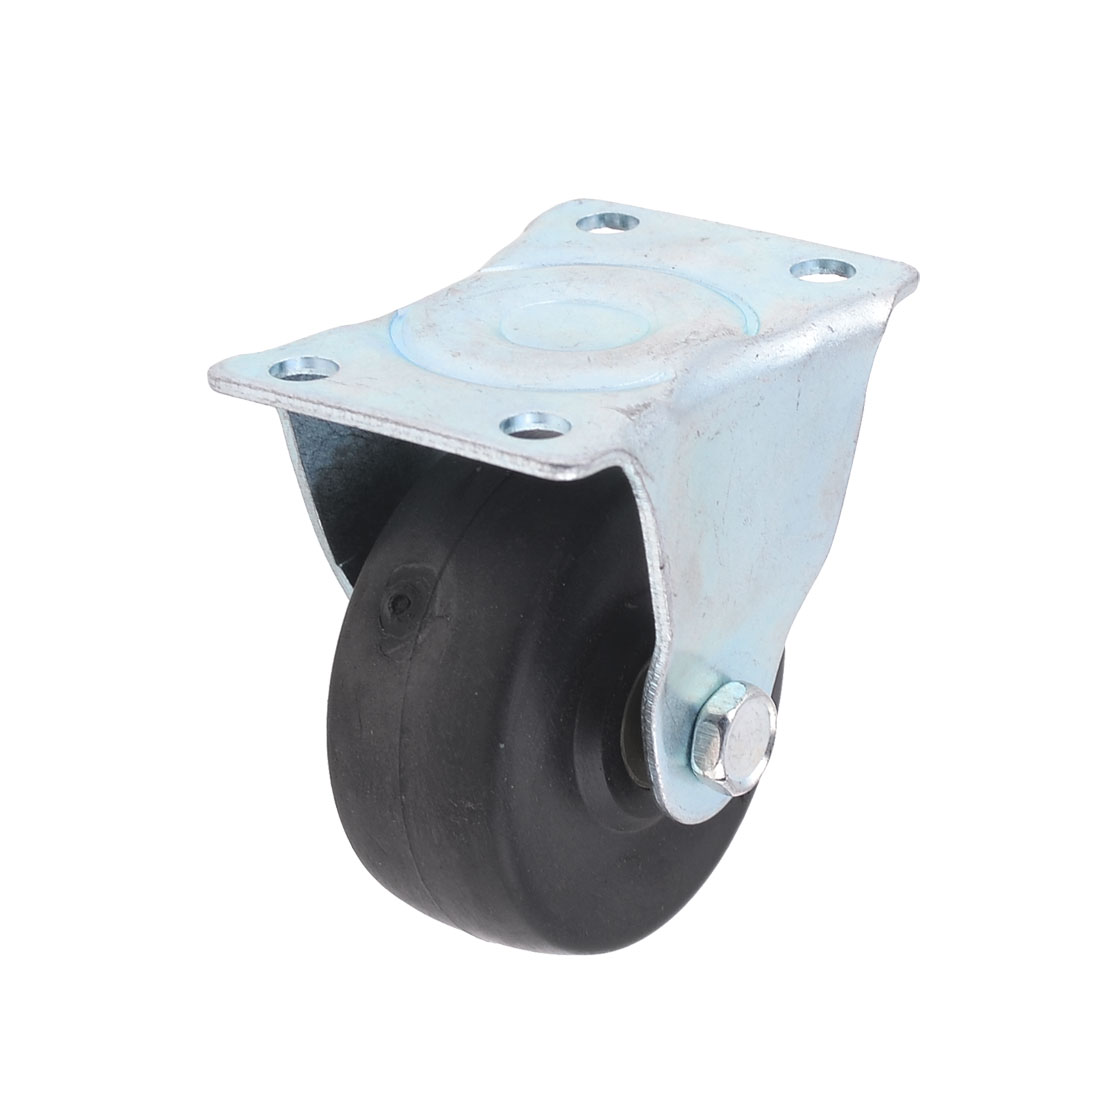 "Sickbed Laundry Cart Swivel Plate 2"" Dia PP Wheel Metal Plate Caster"